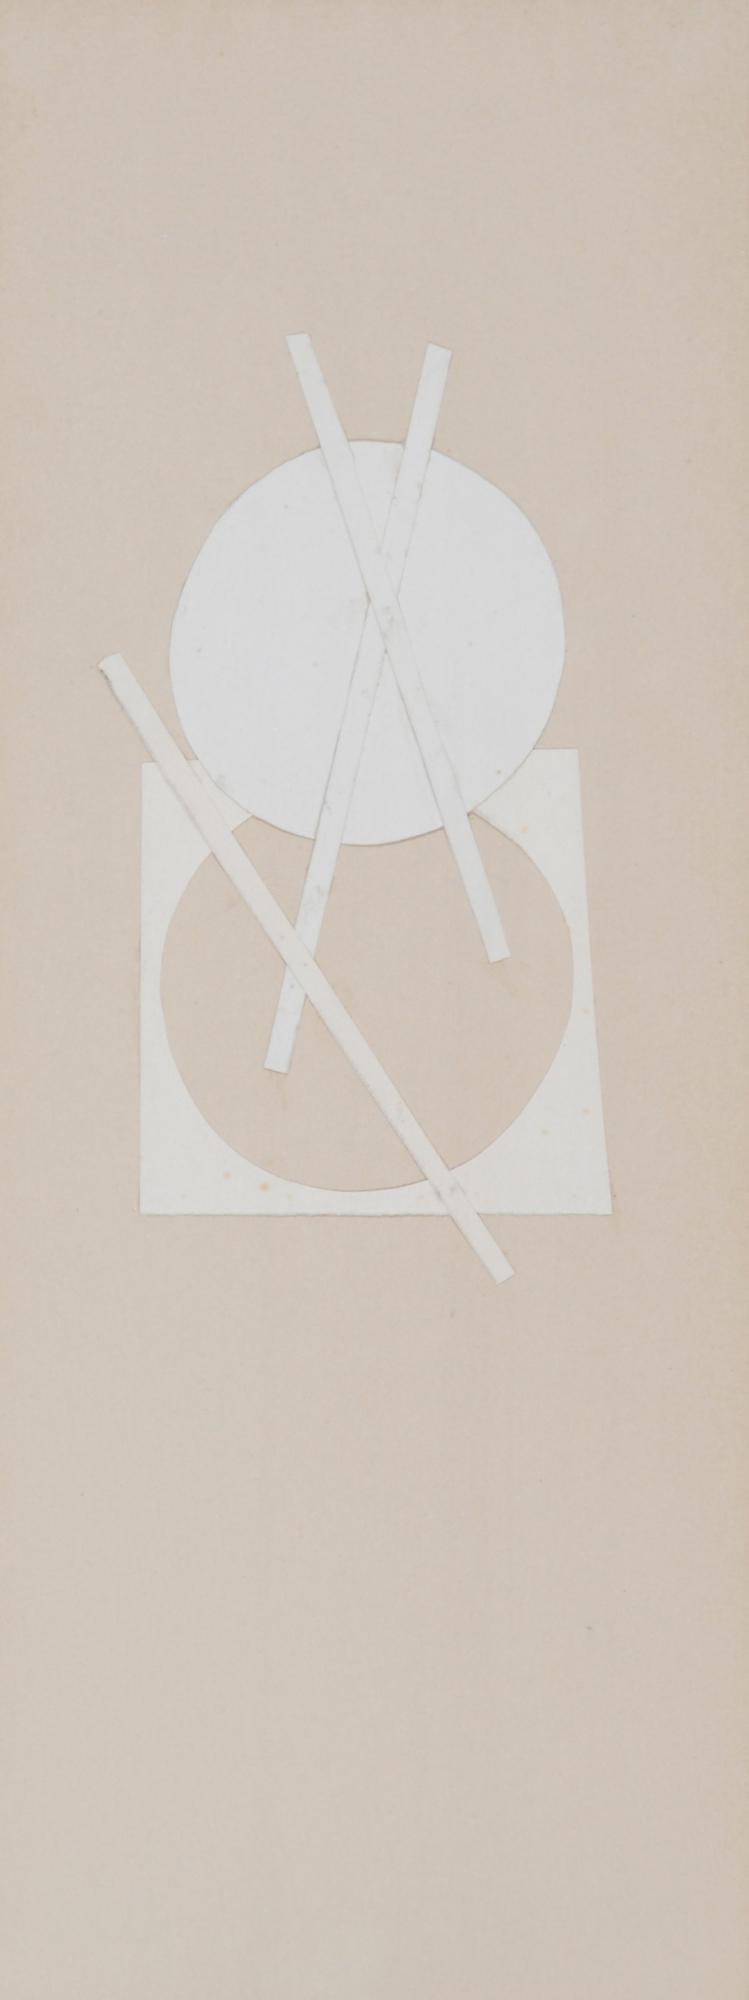 Leuppi Leo, 2 works: Untitled, 1964; Untitled